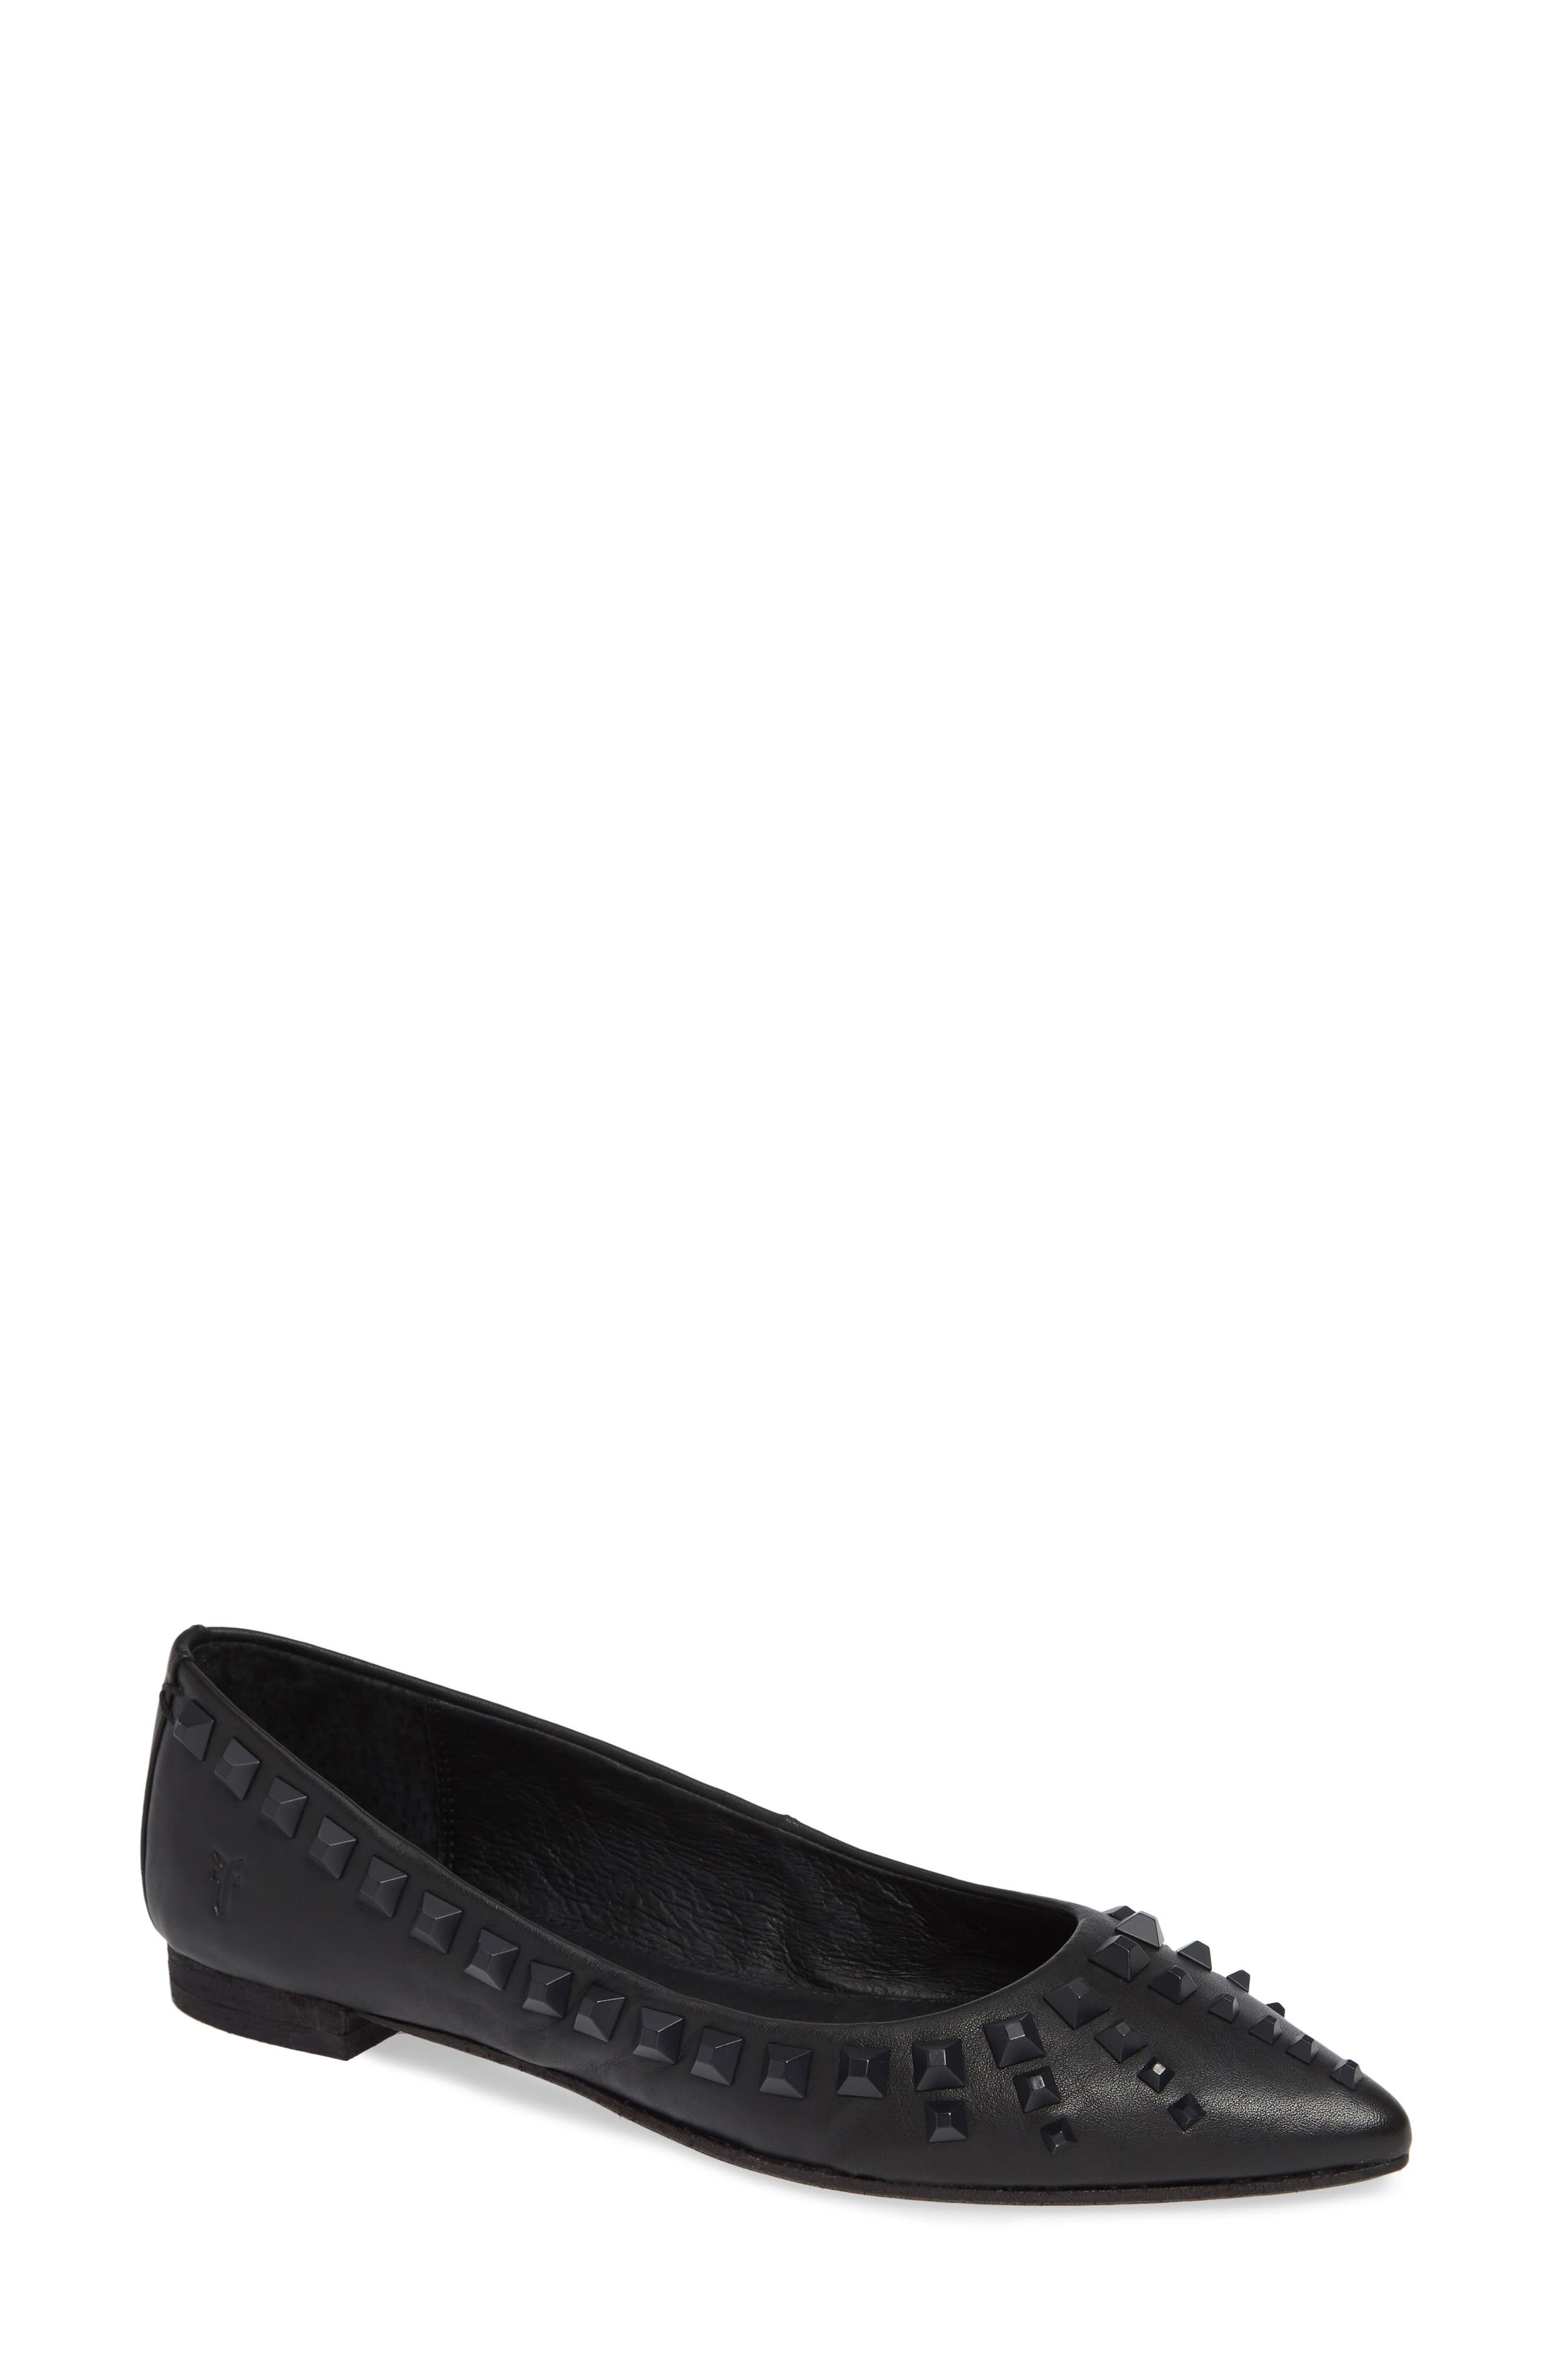 Frye Sienna Deco Stud Ballet Flat- Black